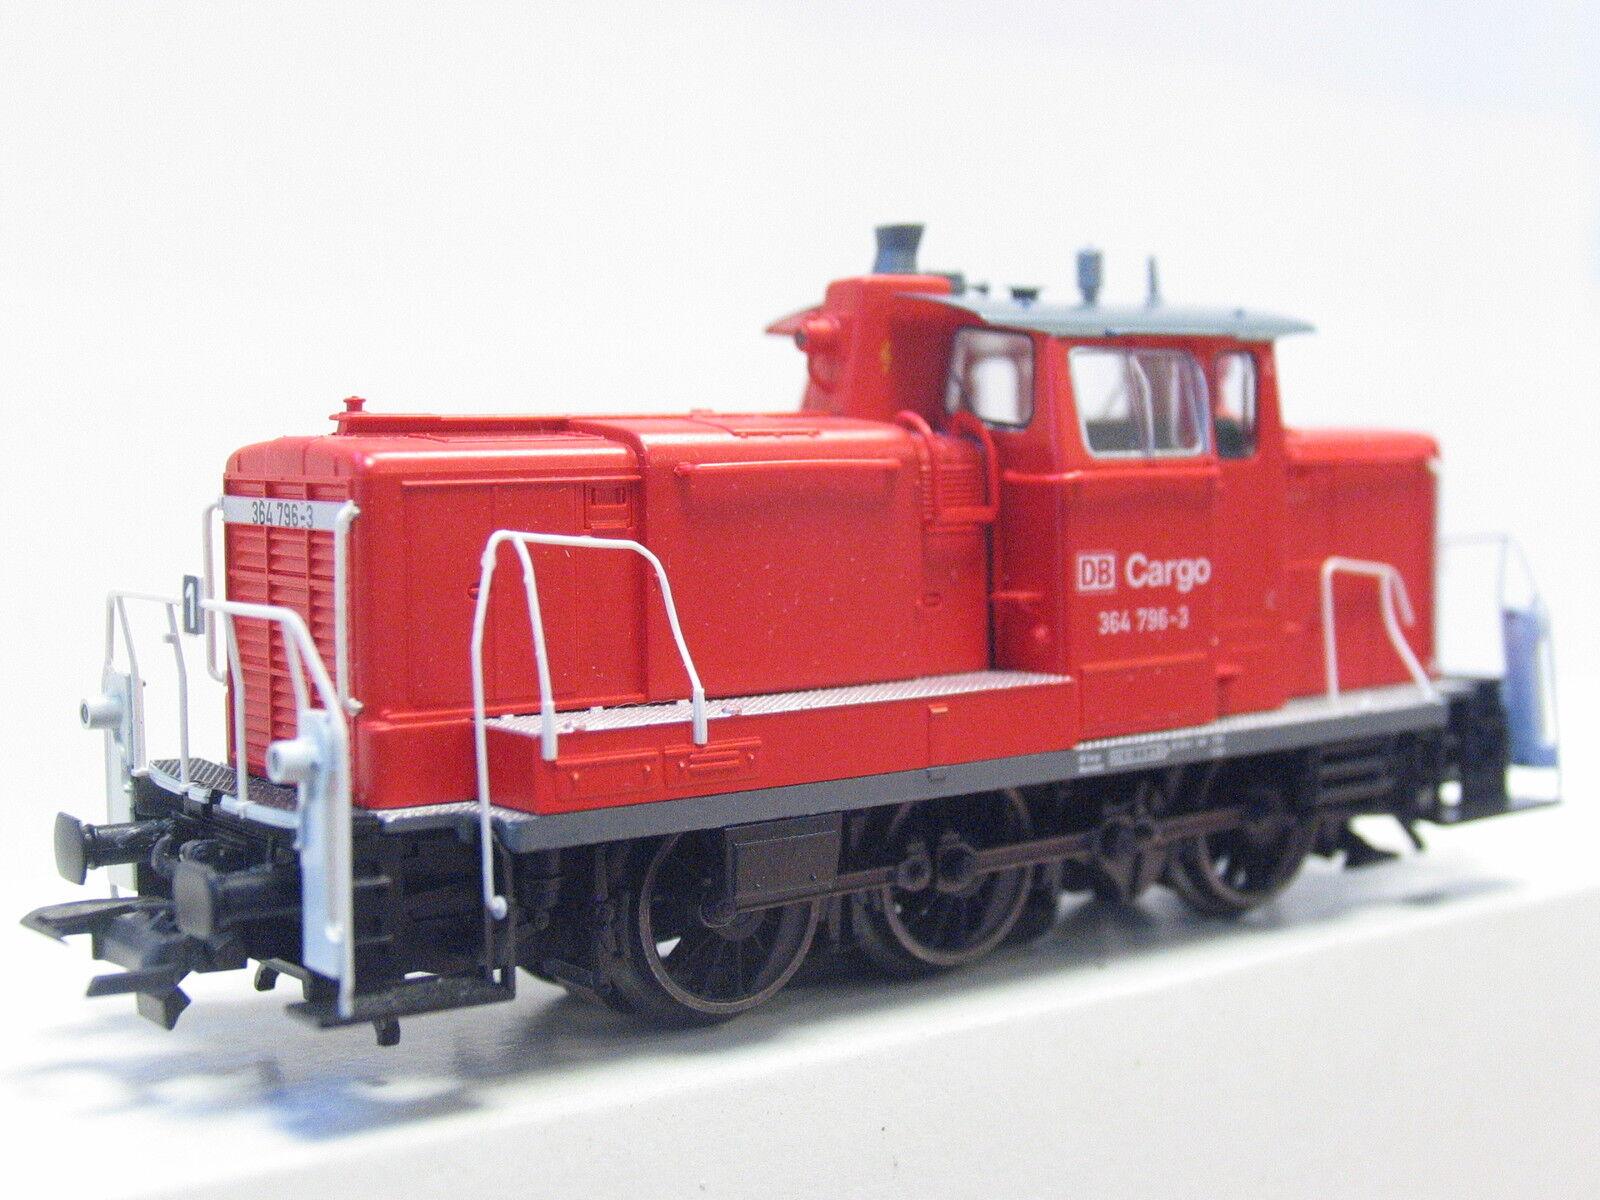 Roco h0 69421 Diesellok BR 364 798-3 DB Cargo Digital AC OVP (q5663)